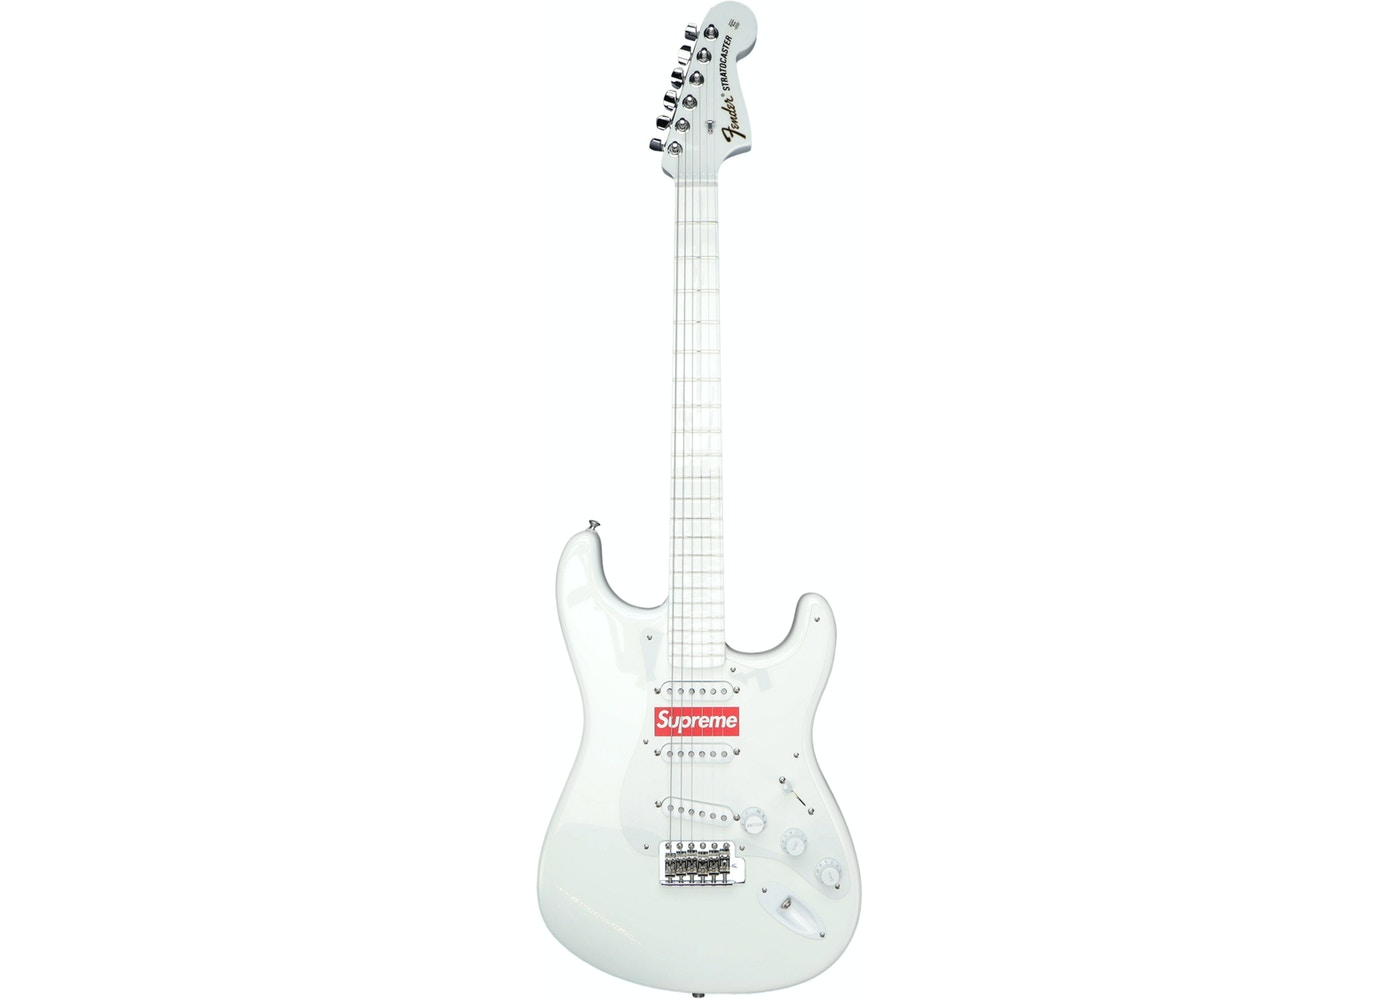 Fender Stratocaster Price >> Supreme Fender Stratocaster White